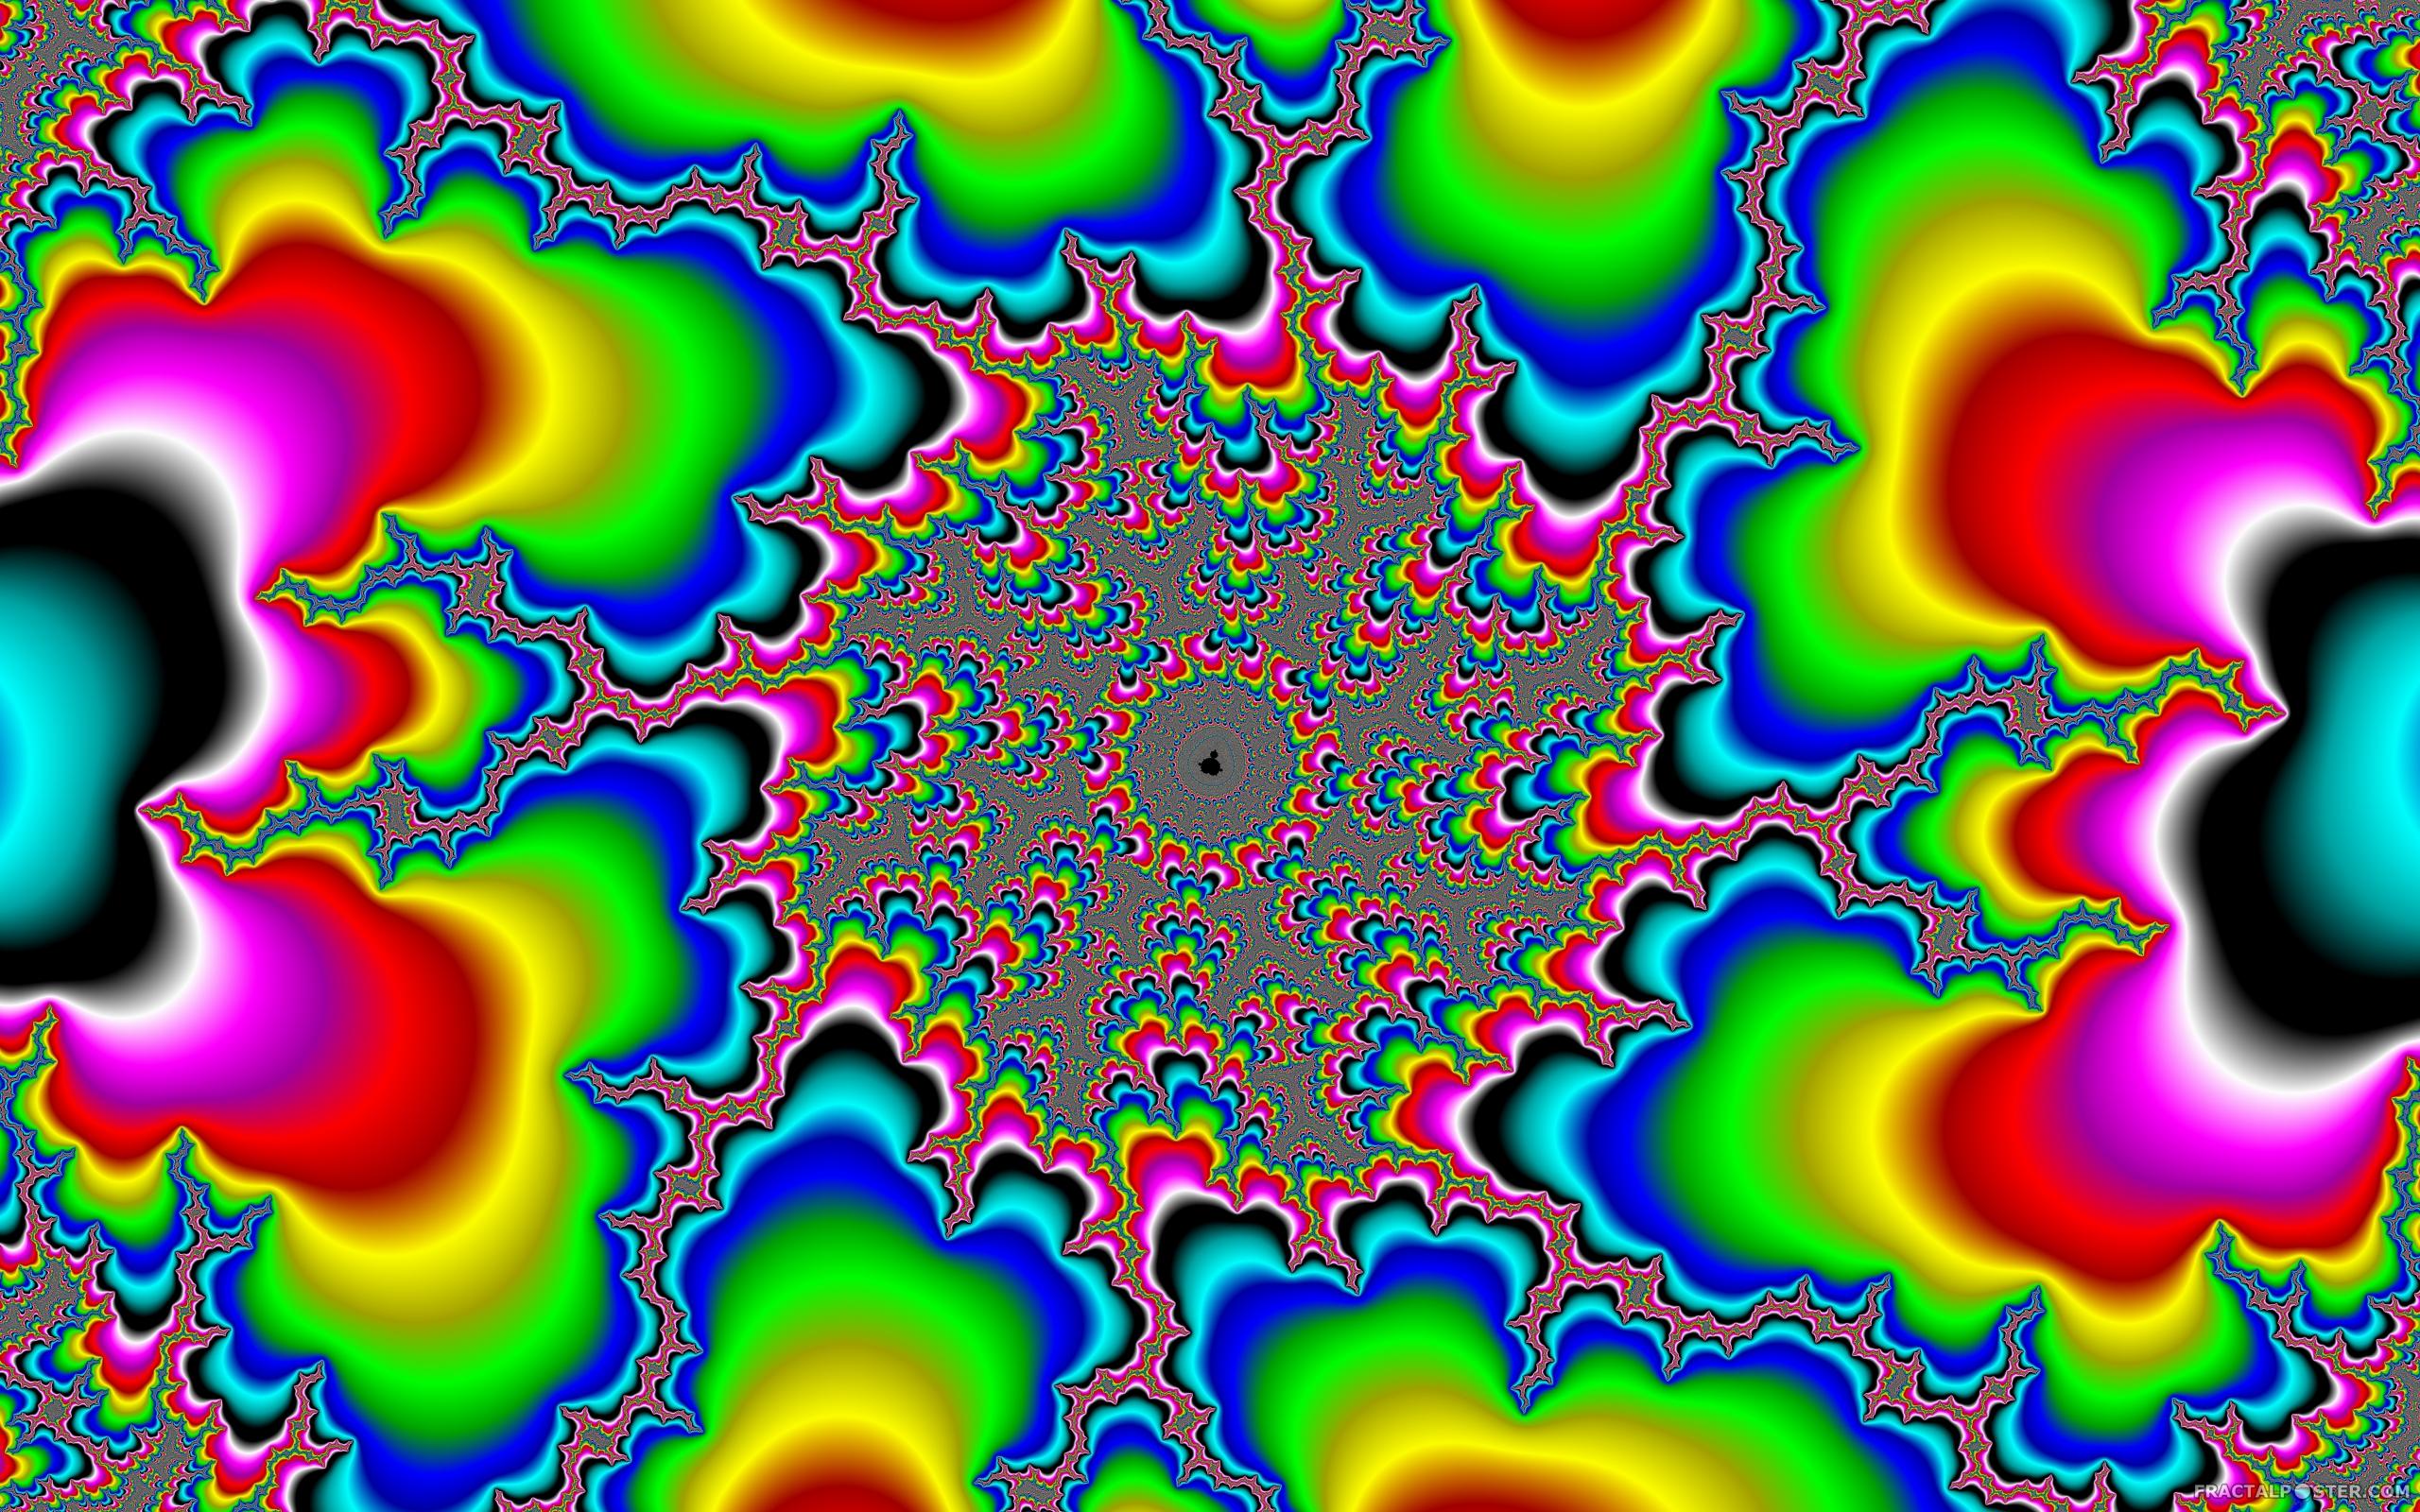 rainbow fractal wallpaper - photo #22